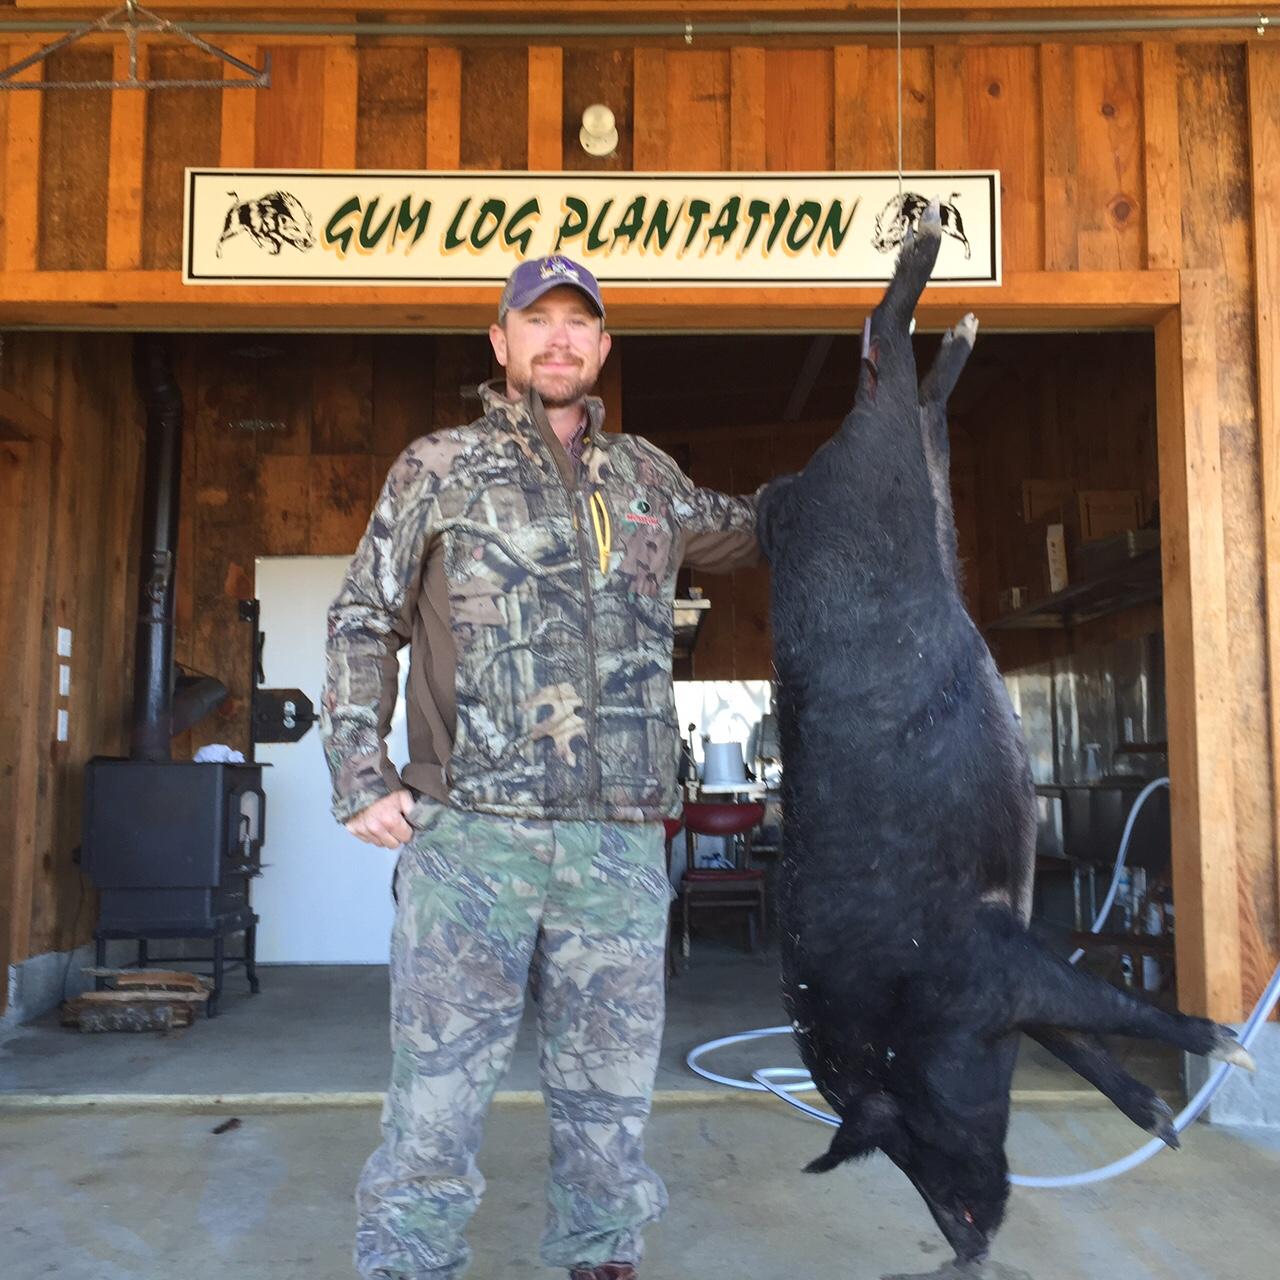 Large Hog